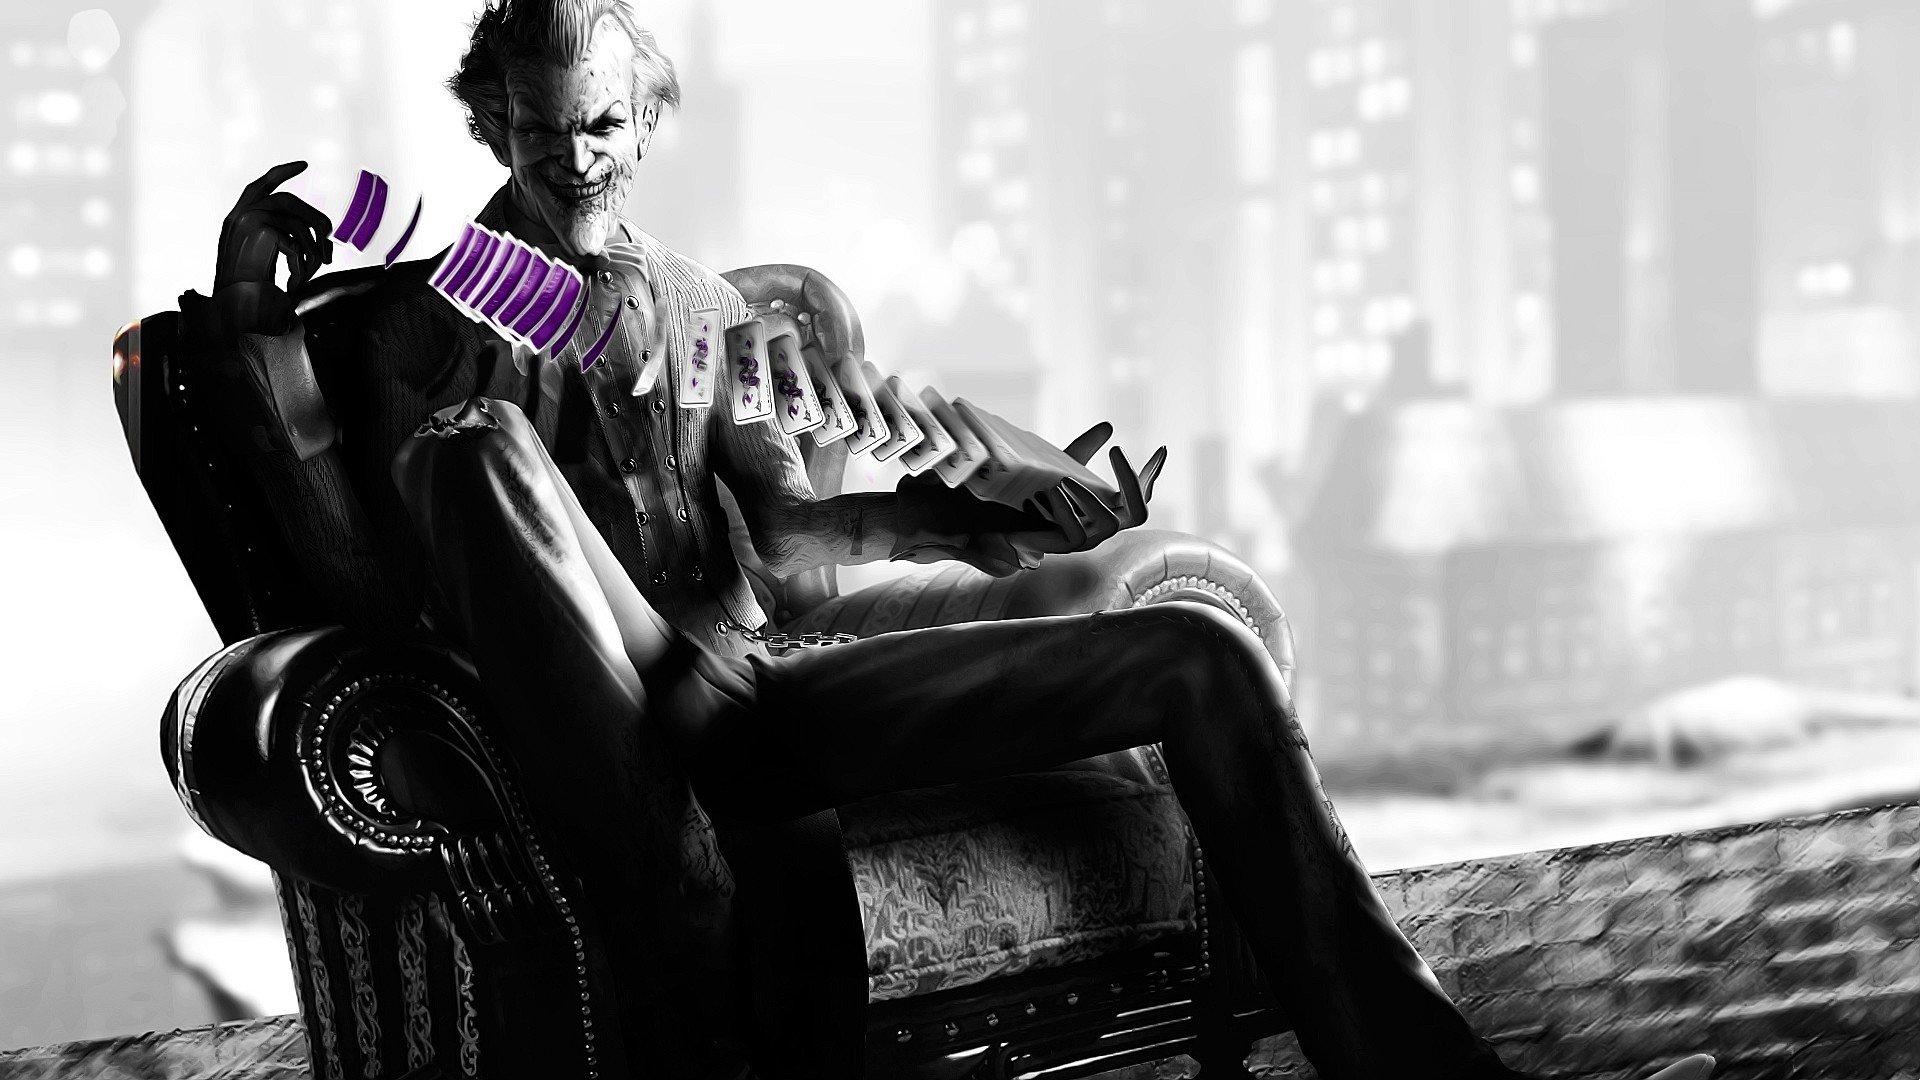 Batman Vs Joker Arkham City Wallpaper